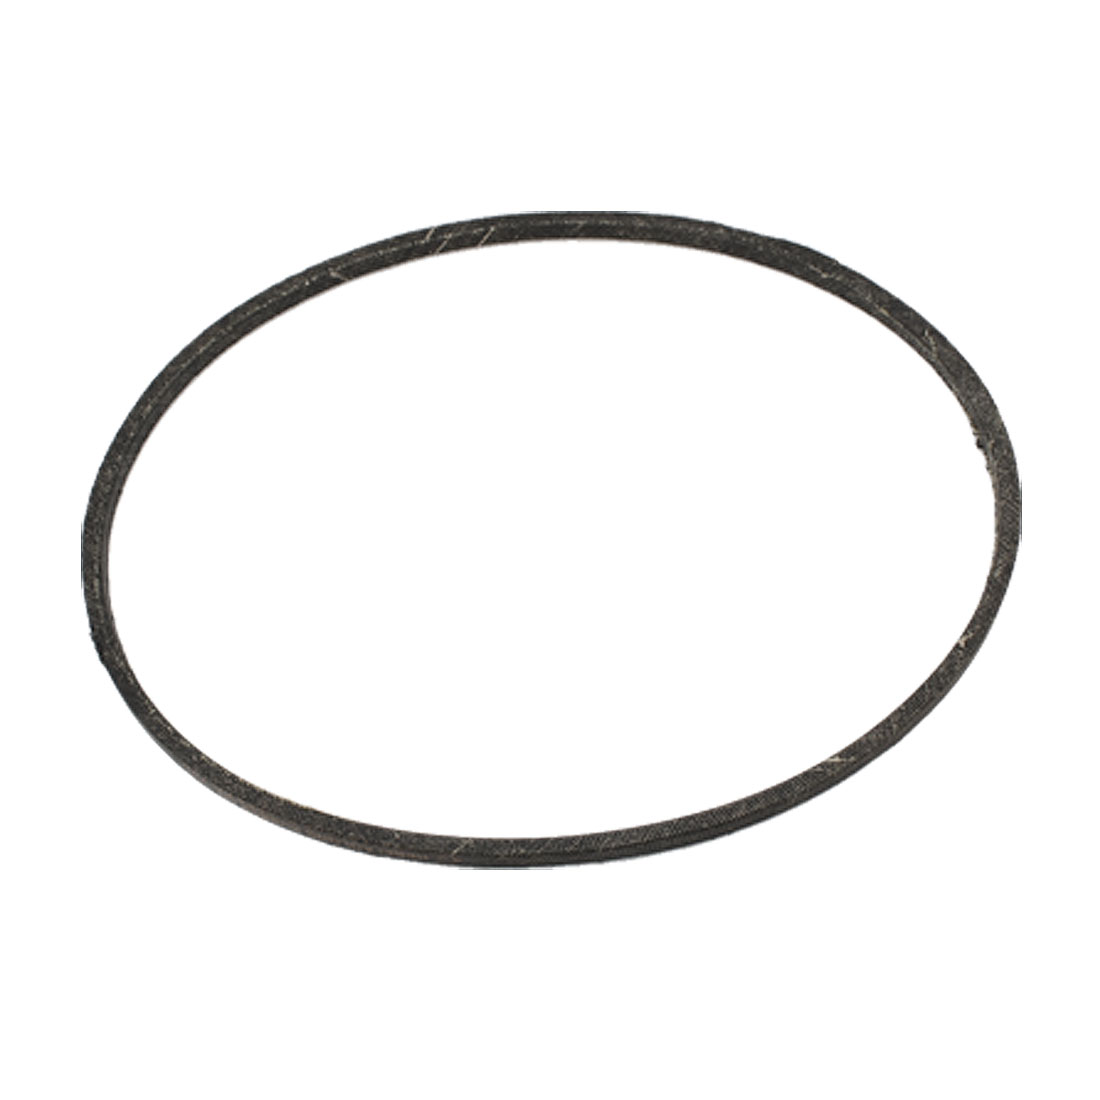 "Washing Machine Washer 780mm 30 7/8"" Inner Girth Rubber V Type Belt"